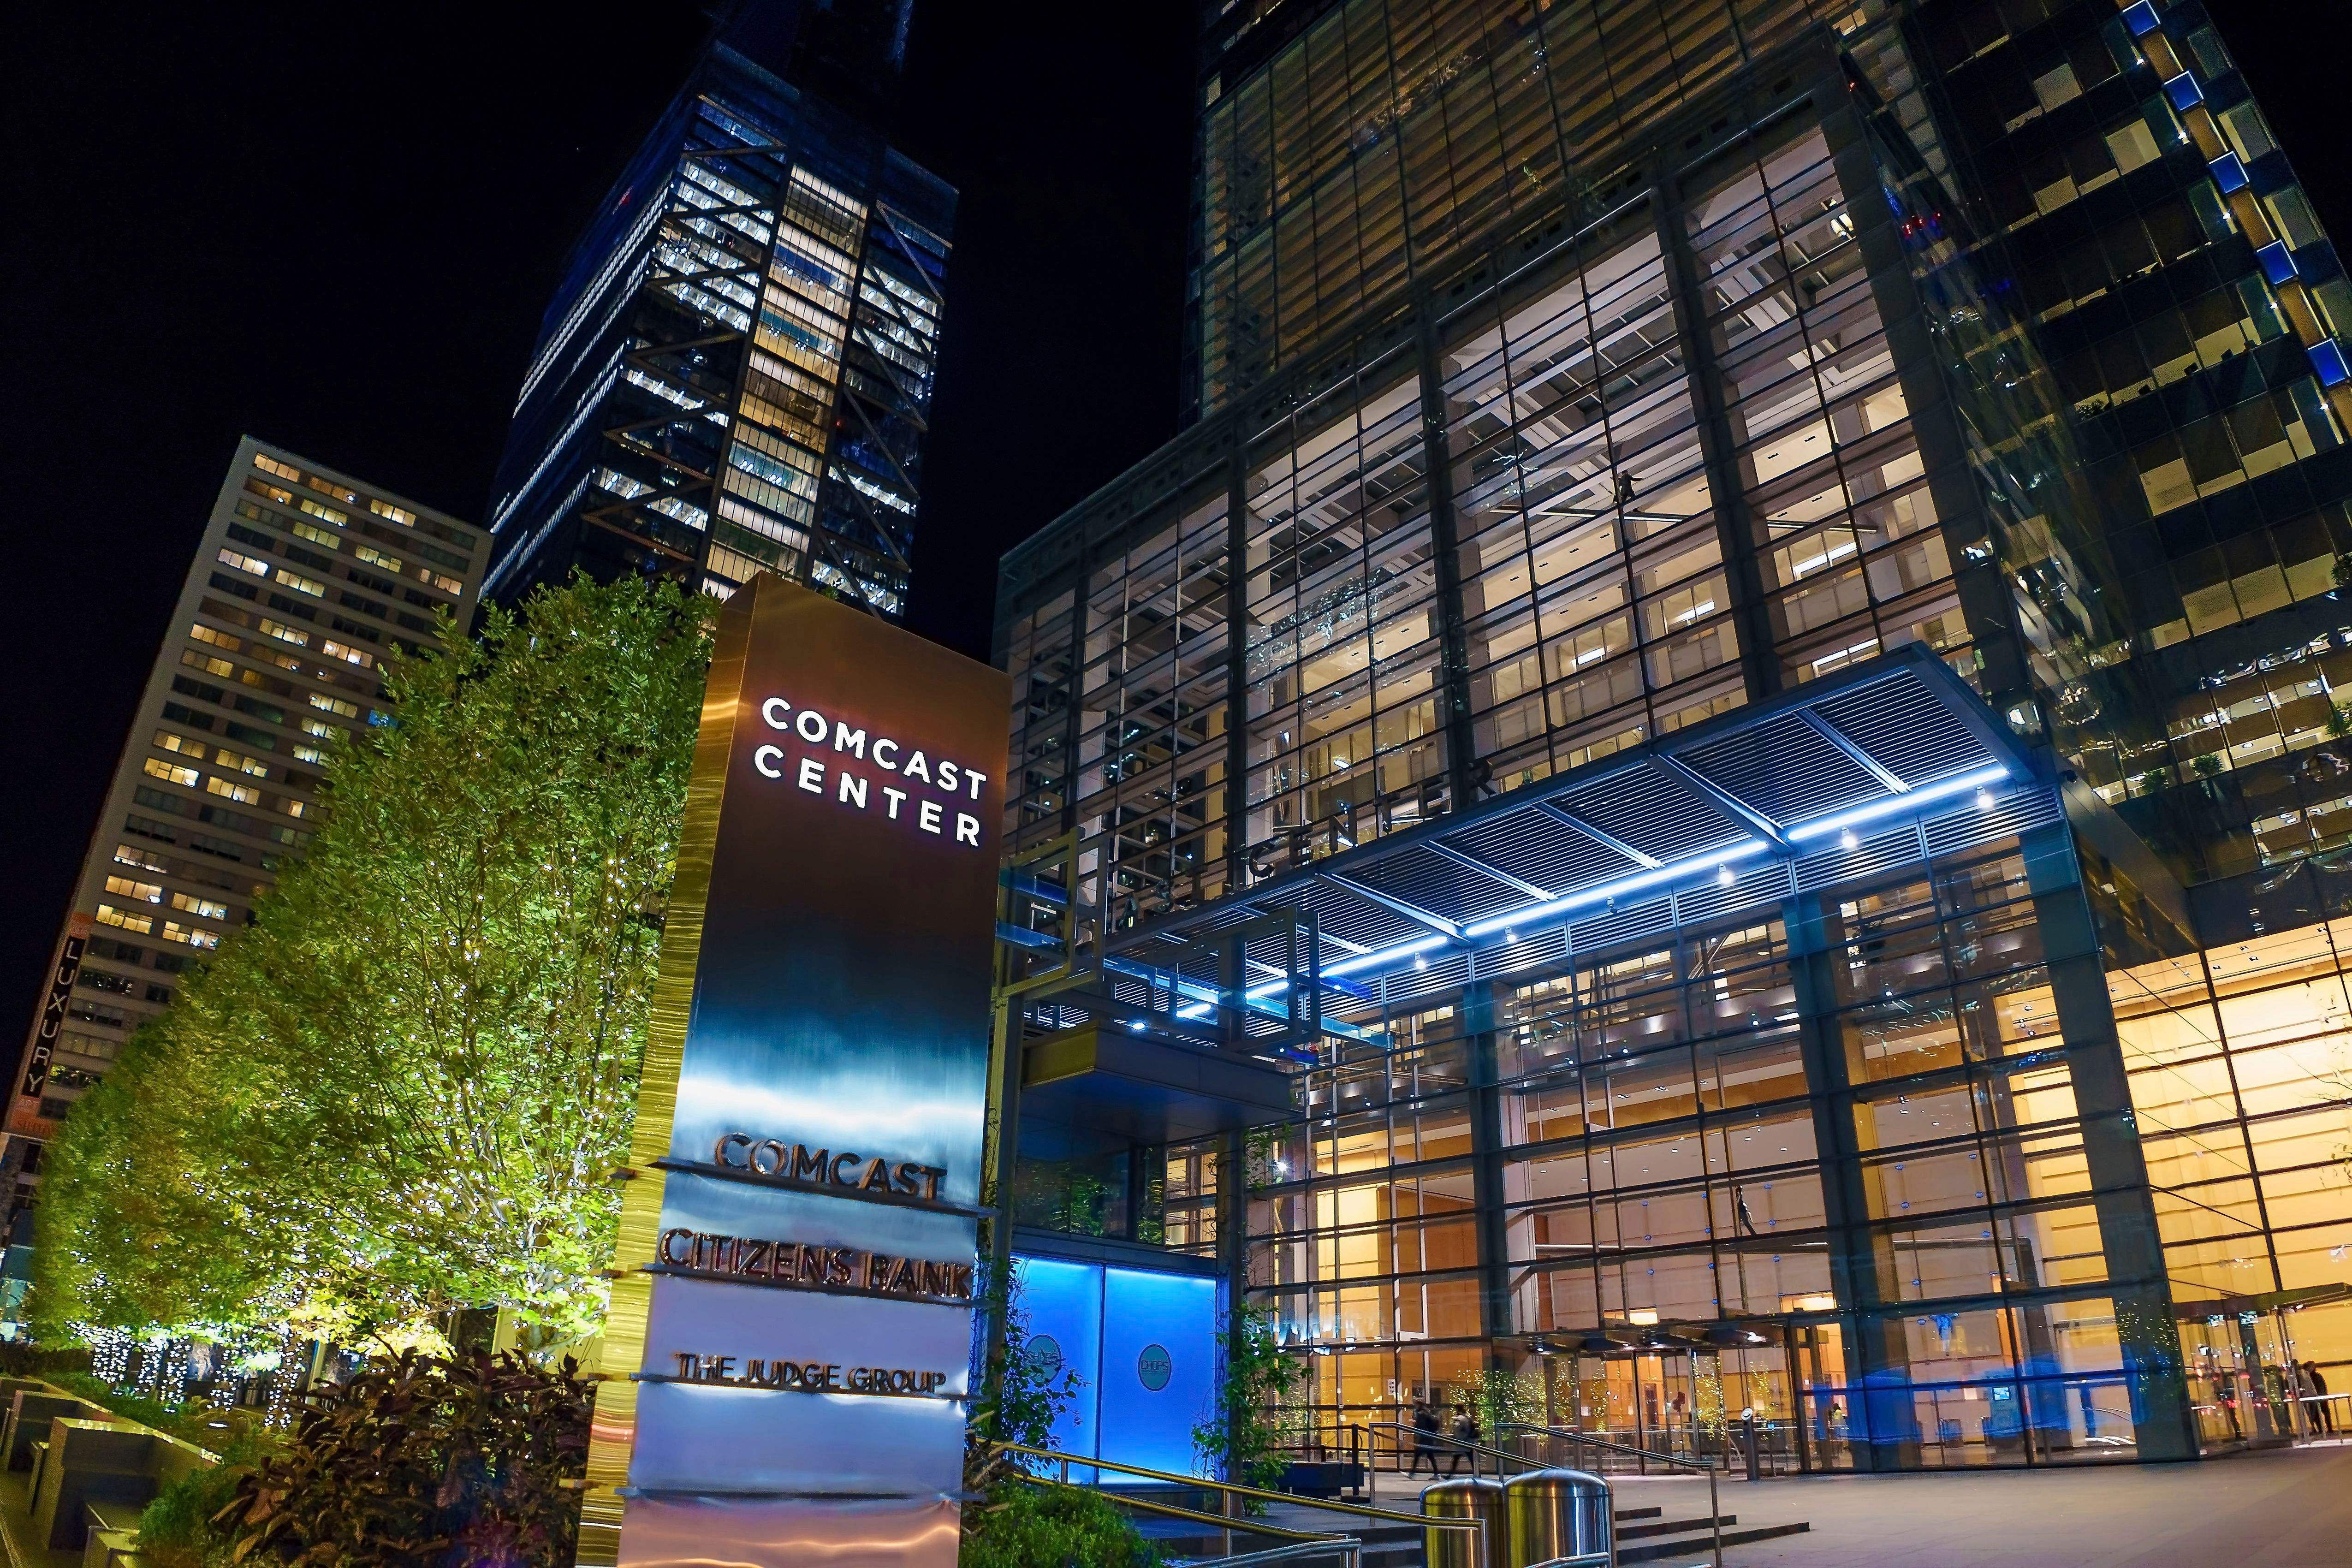 A Look at Comcast Corporation, Philadelphia, USA - 11 Jun 2018